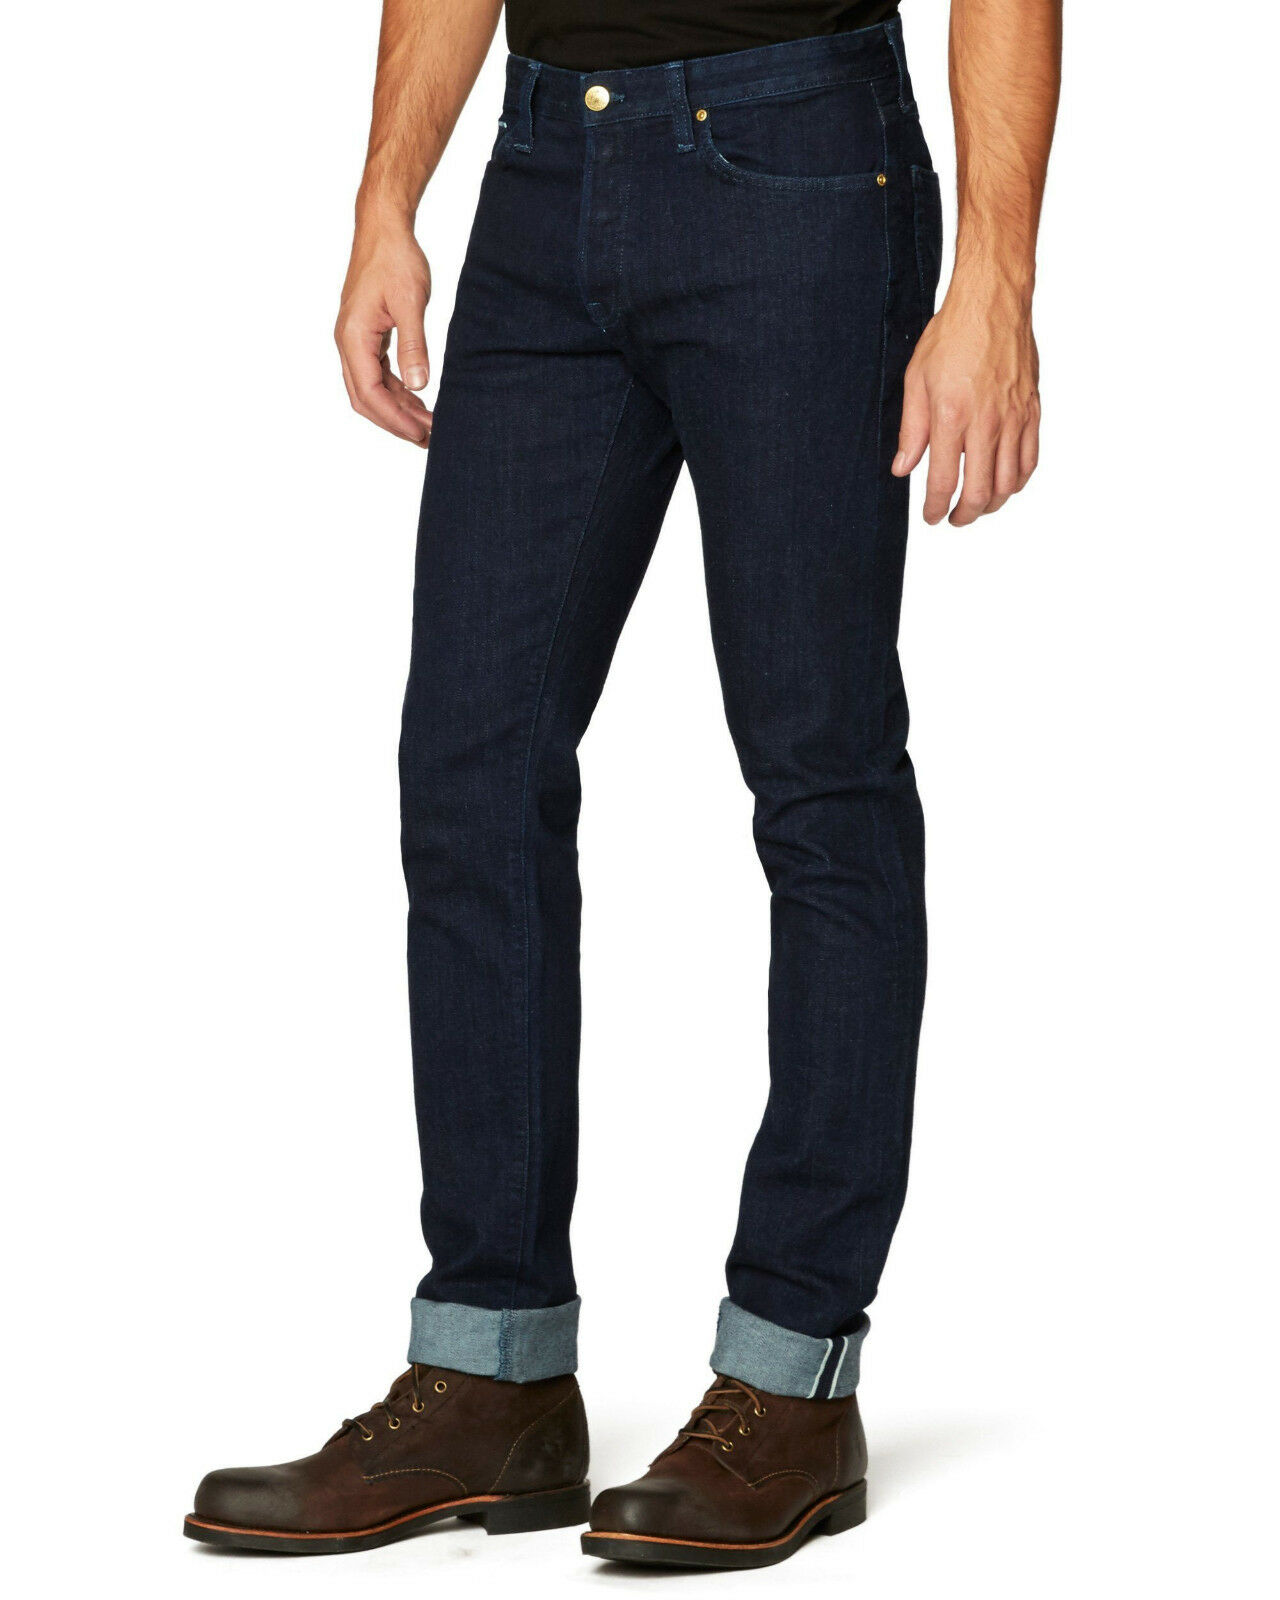 Agave Herren Moderne Passen Jeans Draper Waschung Kanten Hergestellt in USA